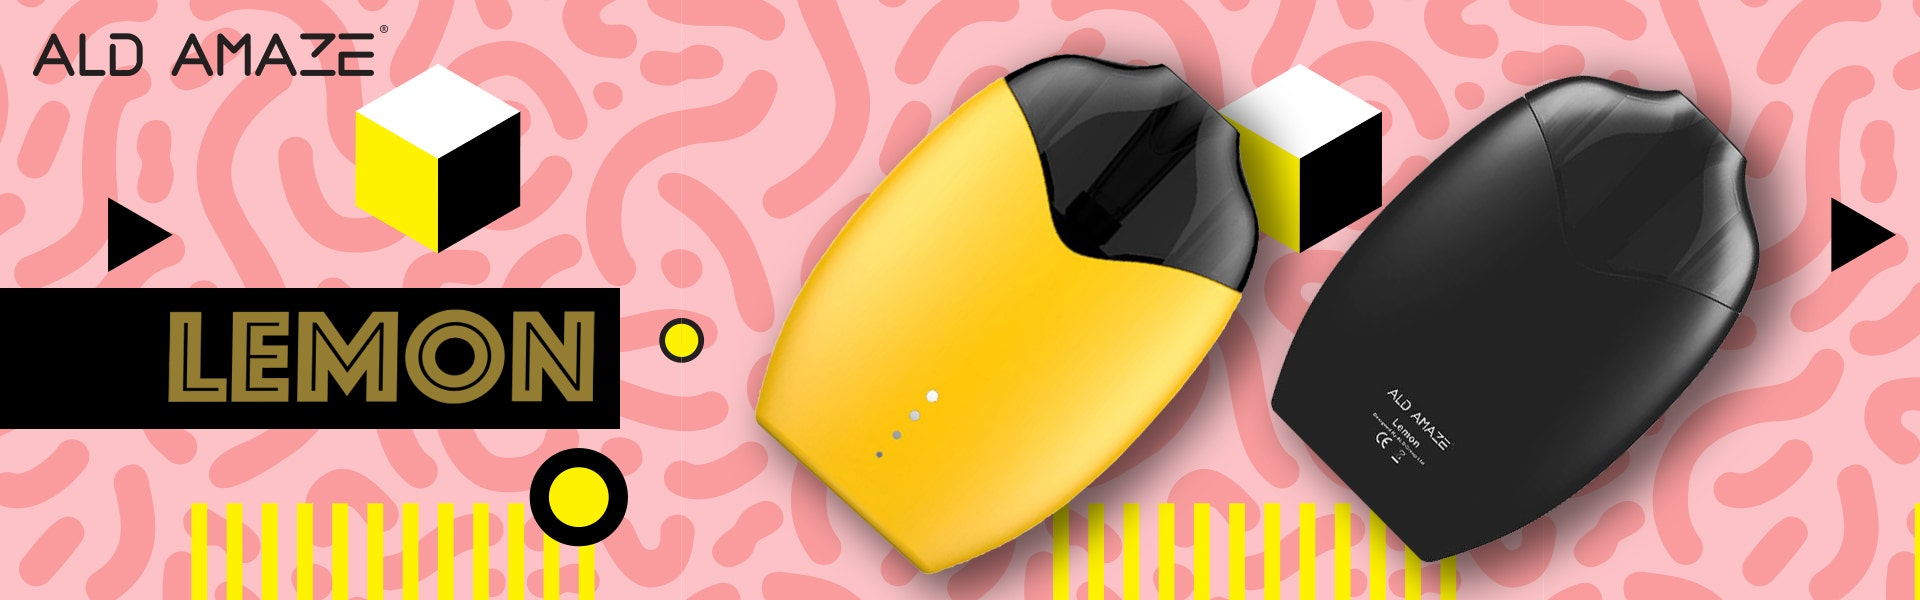 ALD Amaze Lemon Pod Device